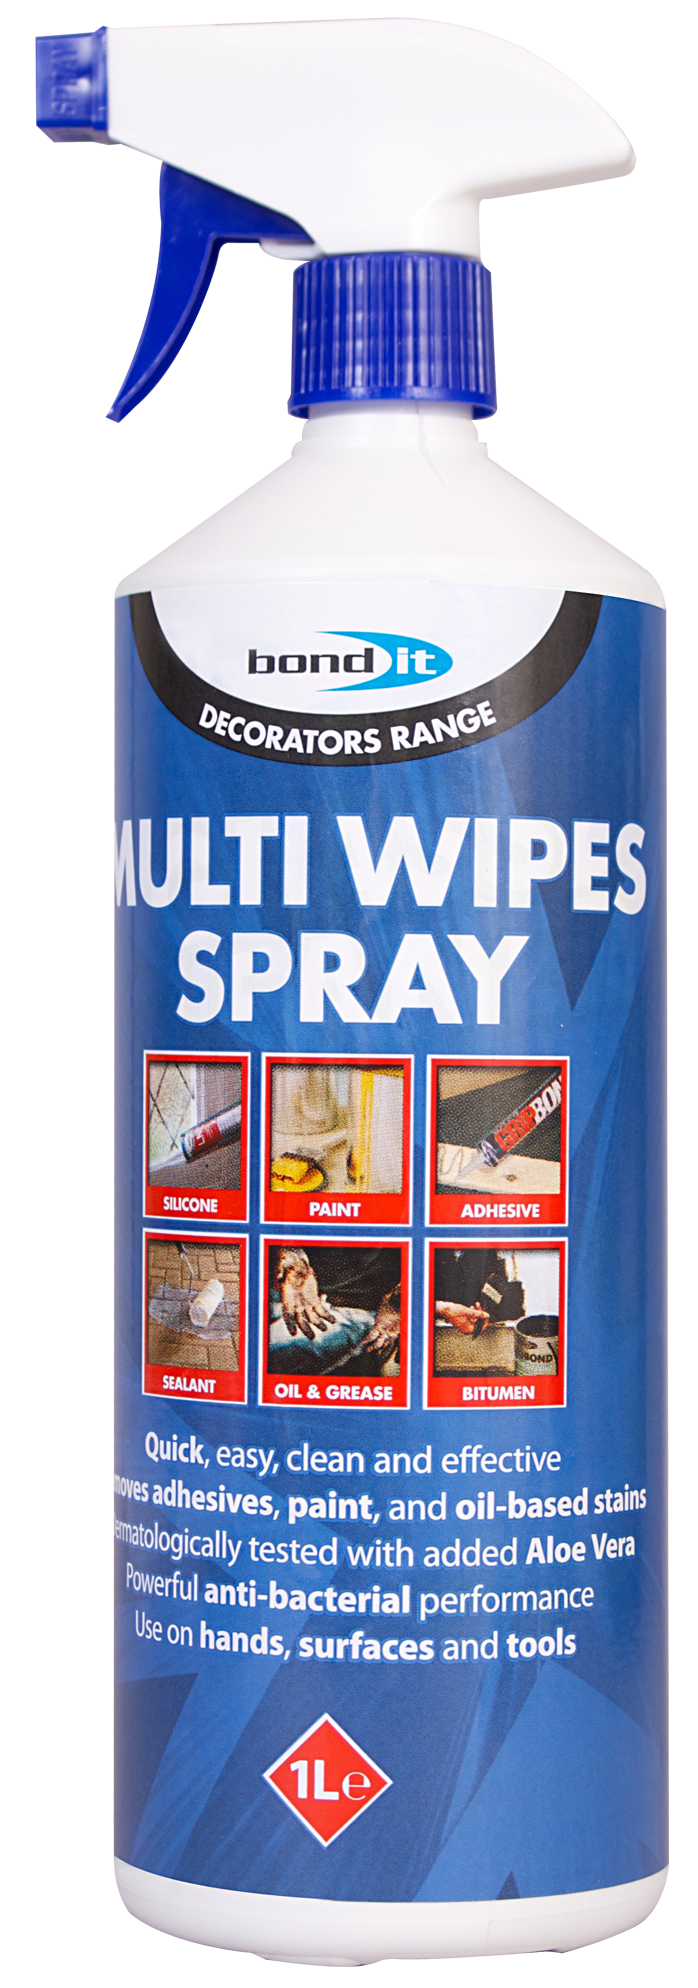 bond-it-multi-wipes-spray-1ltr